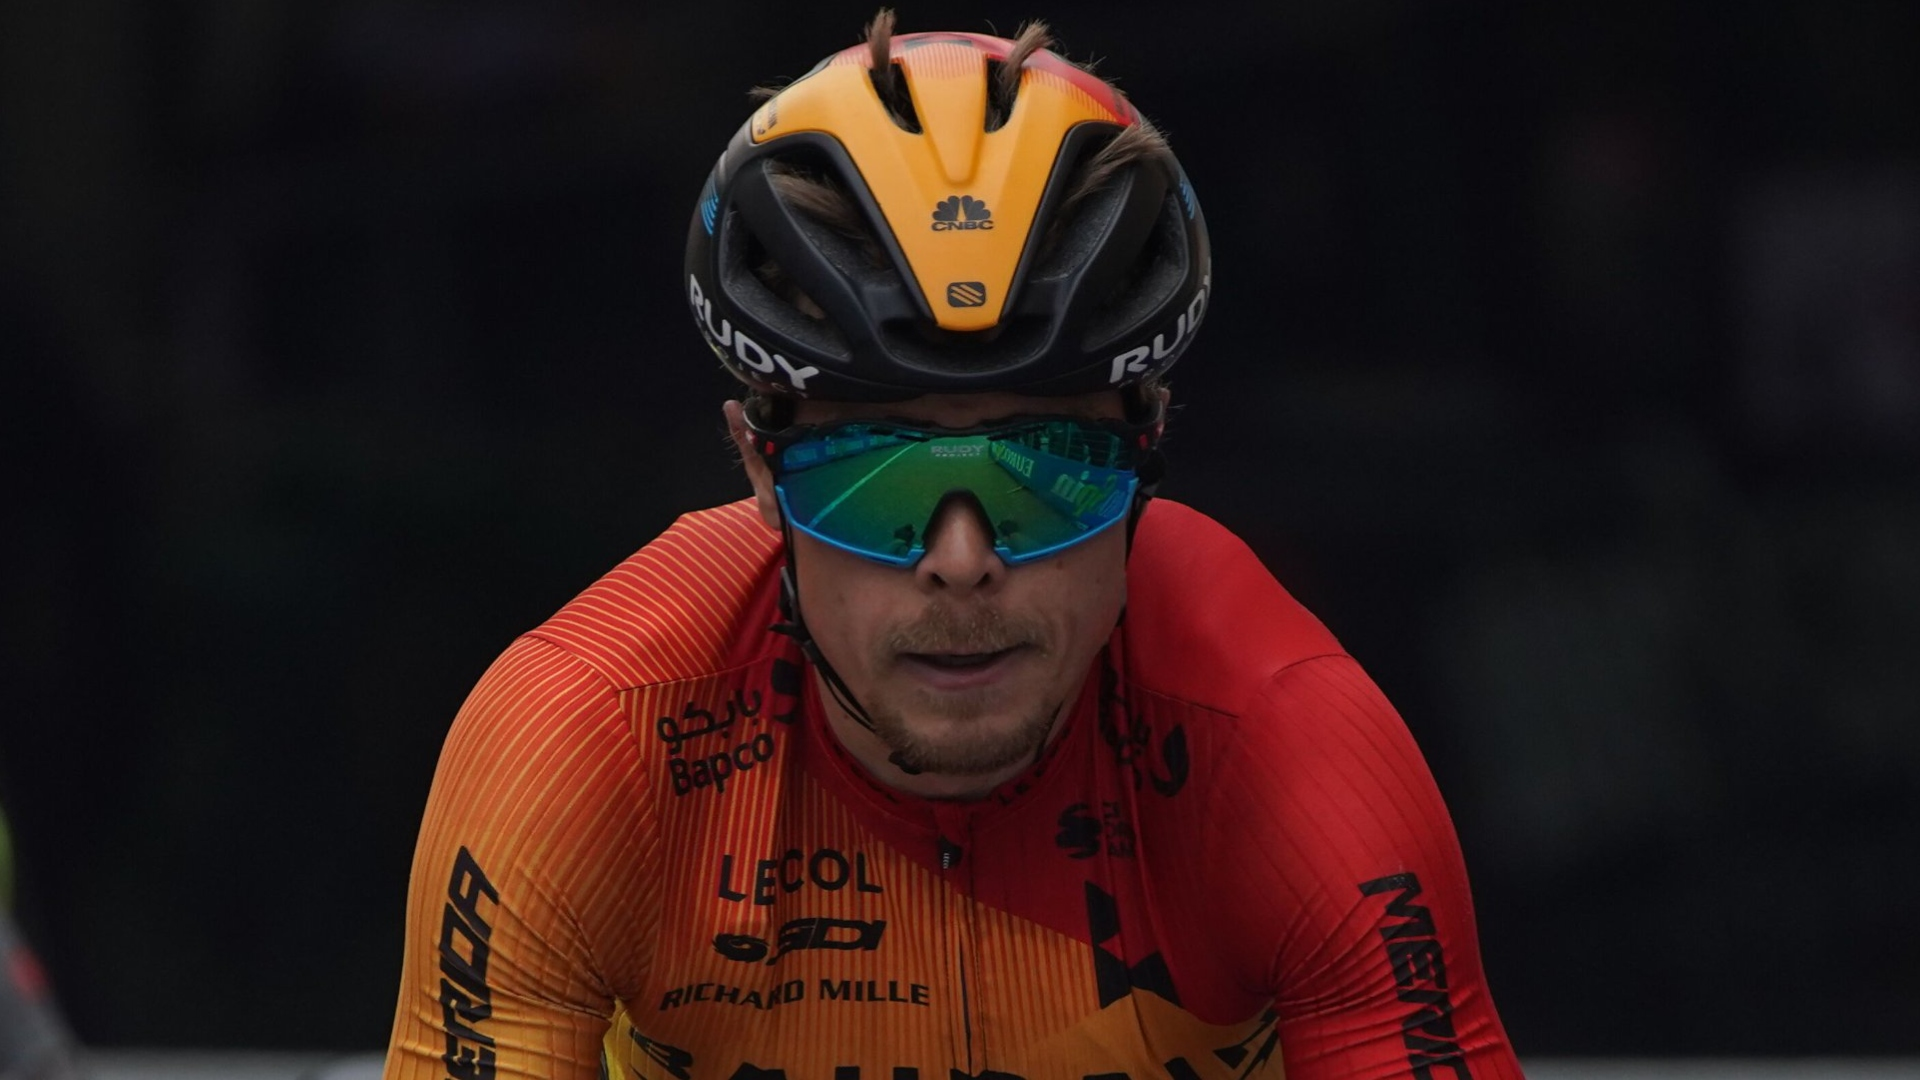 Giro d'Italia: Tratnik adds to Slovenian success